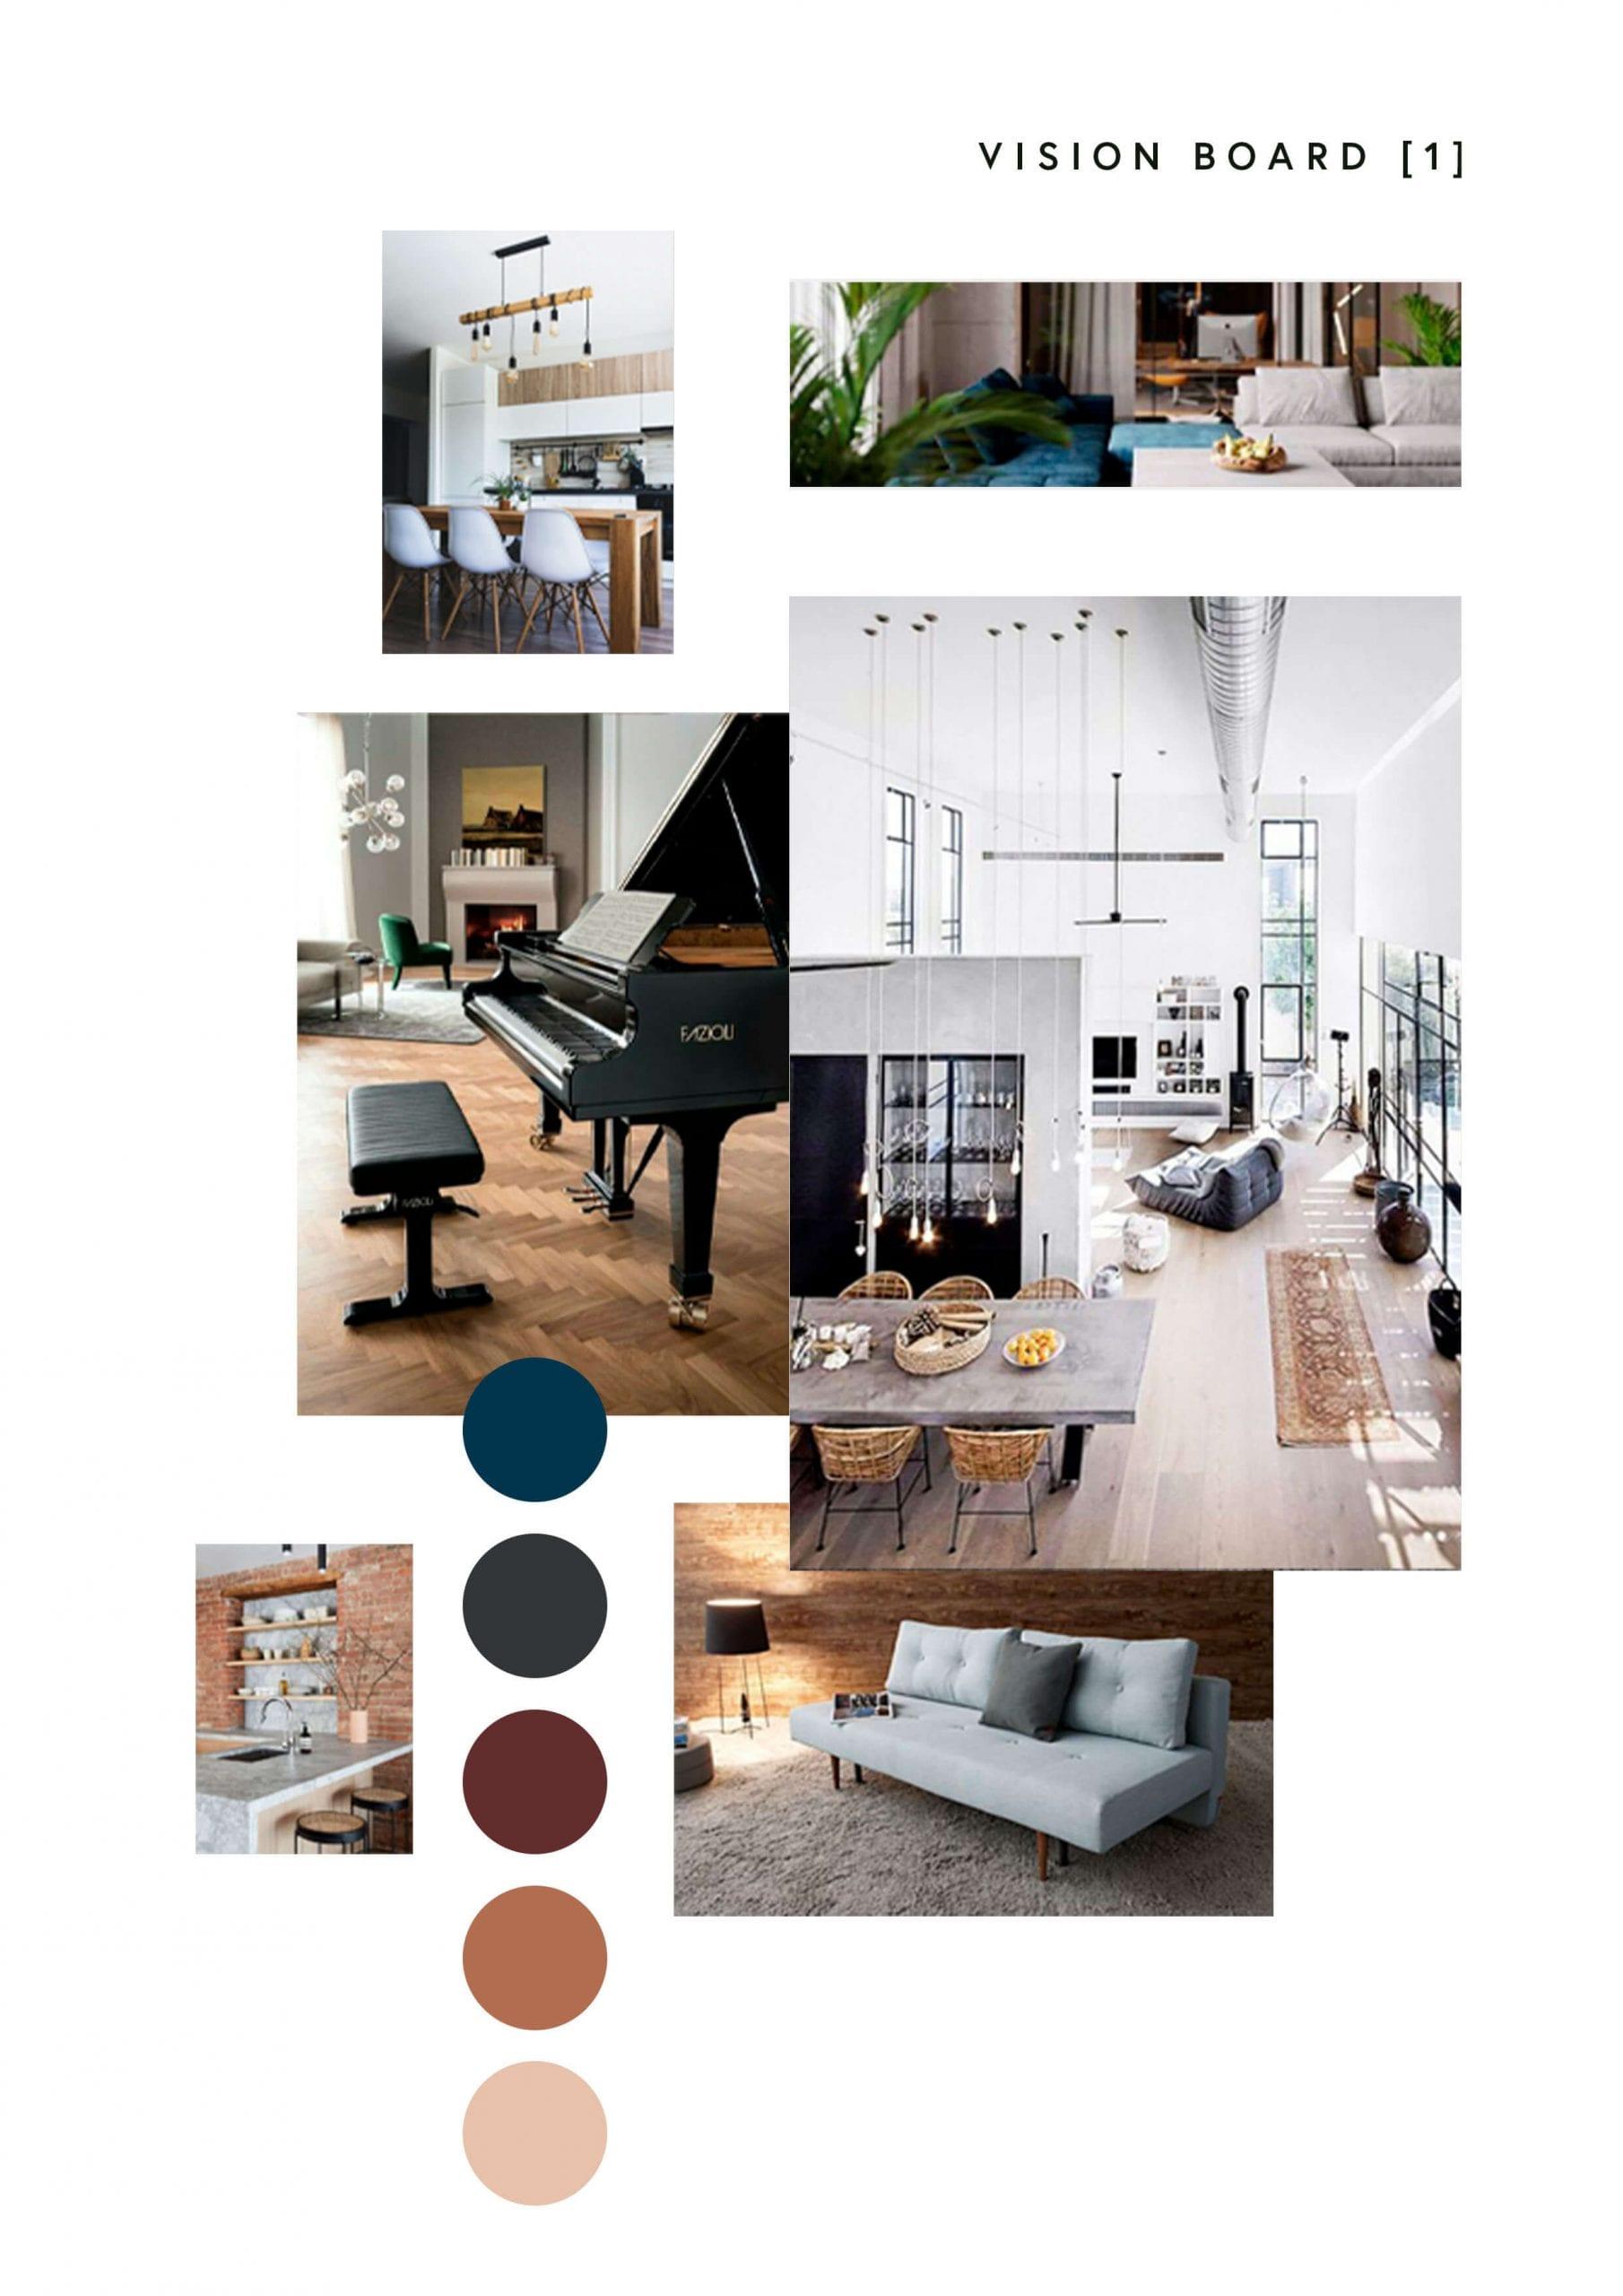 ann-rod-interior-styling-advice-vision-board-1